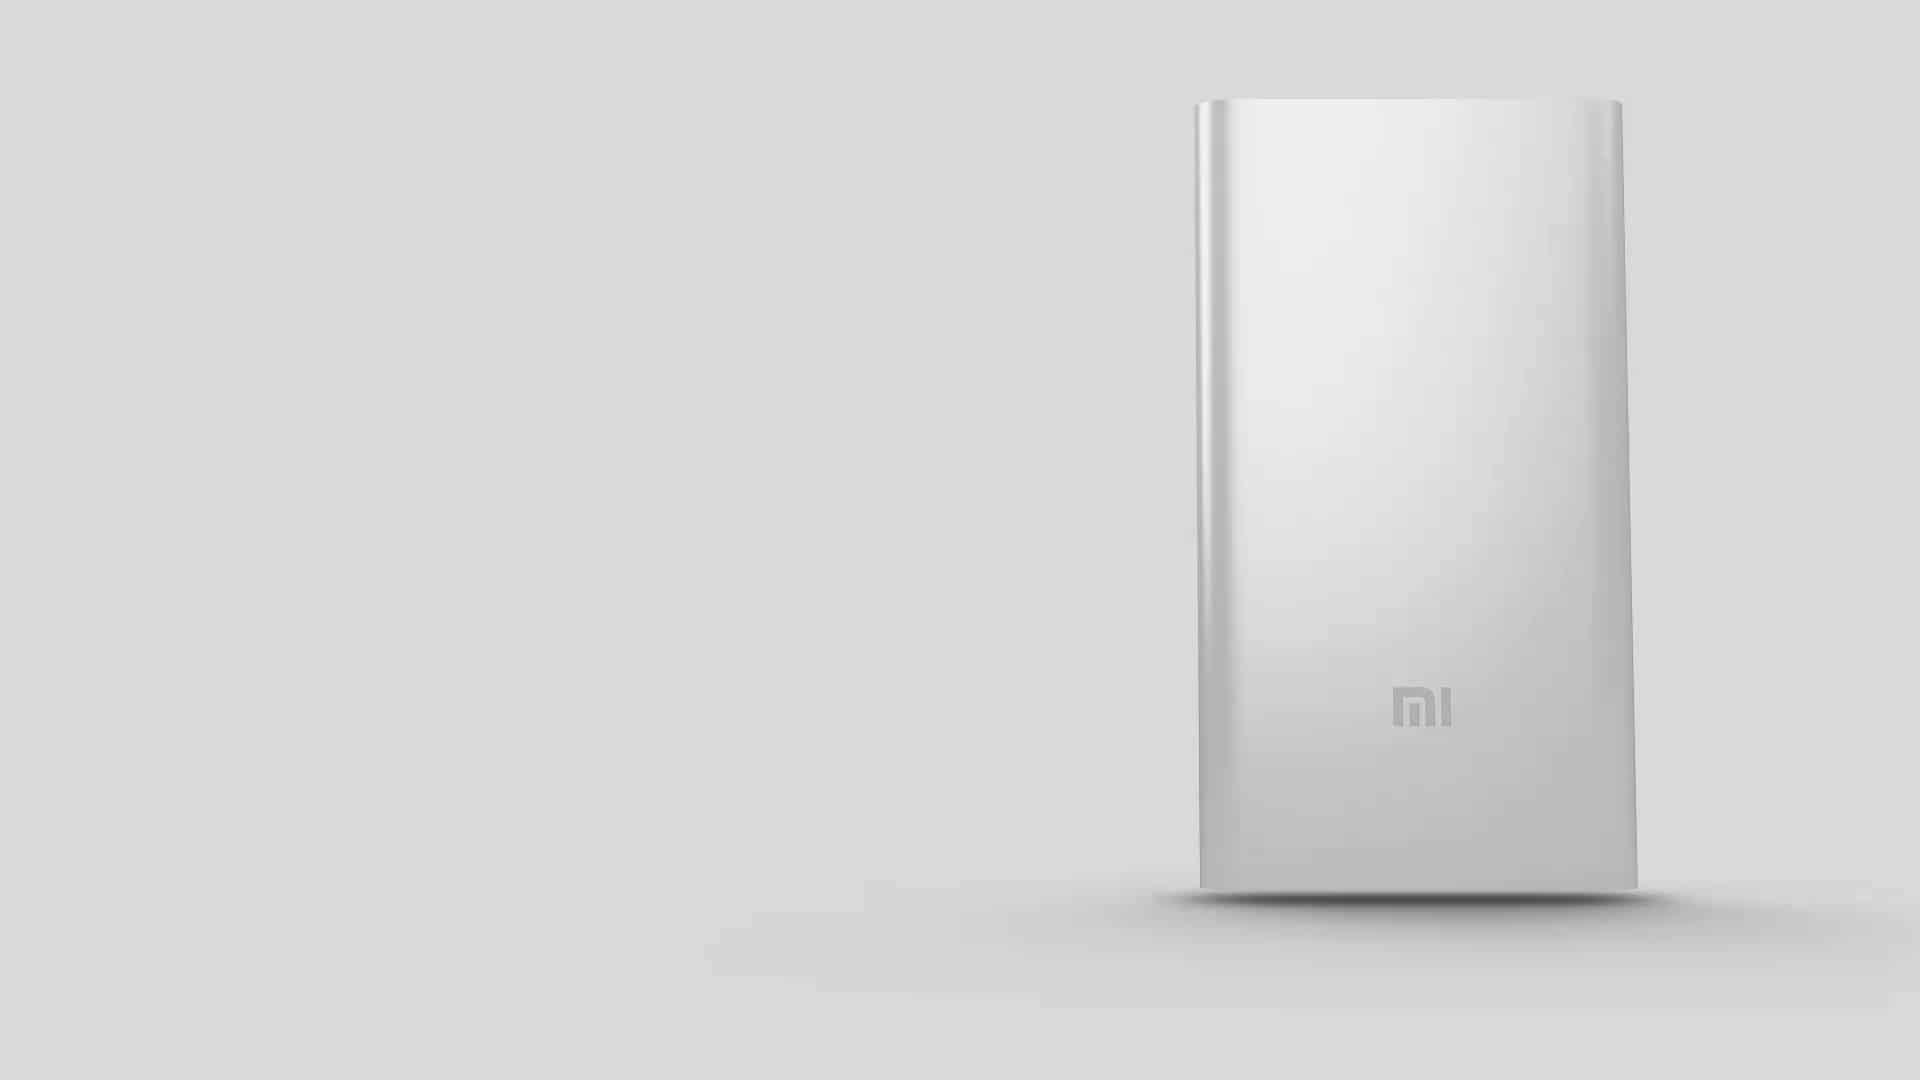 Original Xiaomi 5000mAh Mobile Power Bank Li-Polymer Battery Charger - SILVER 120071401